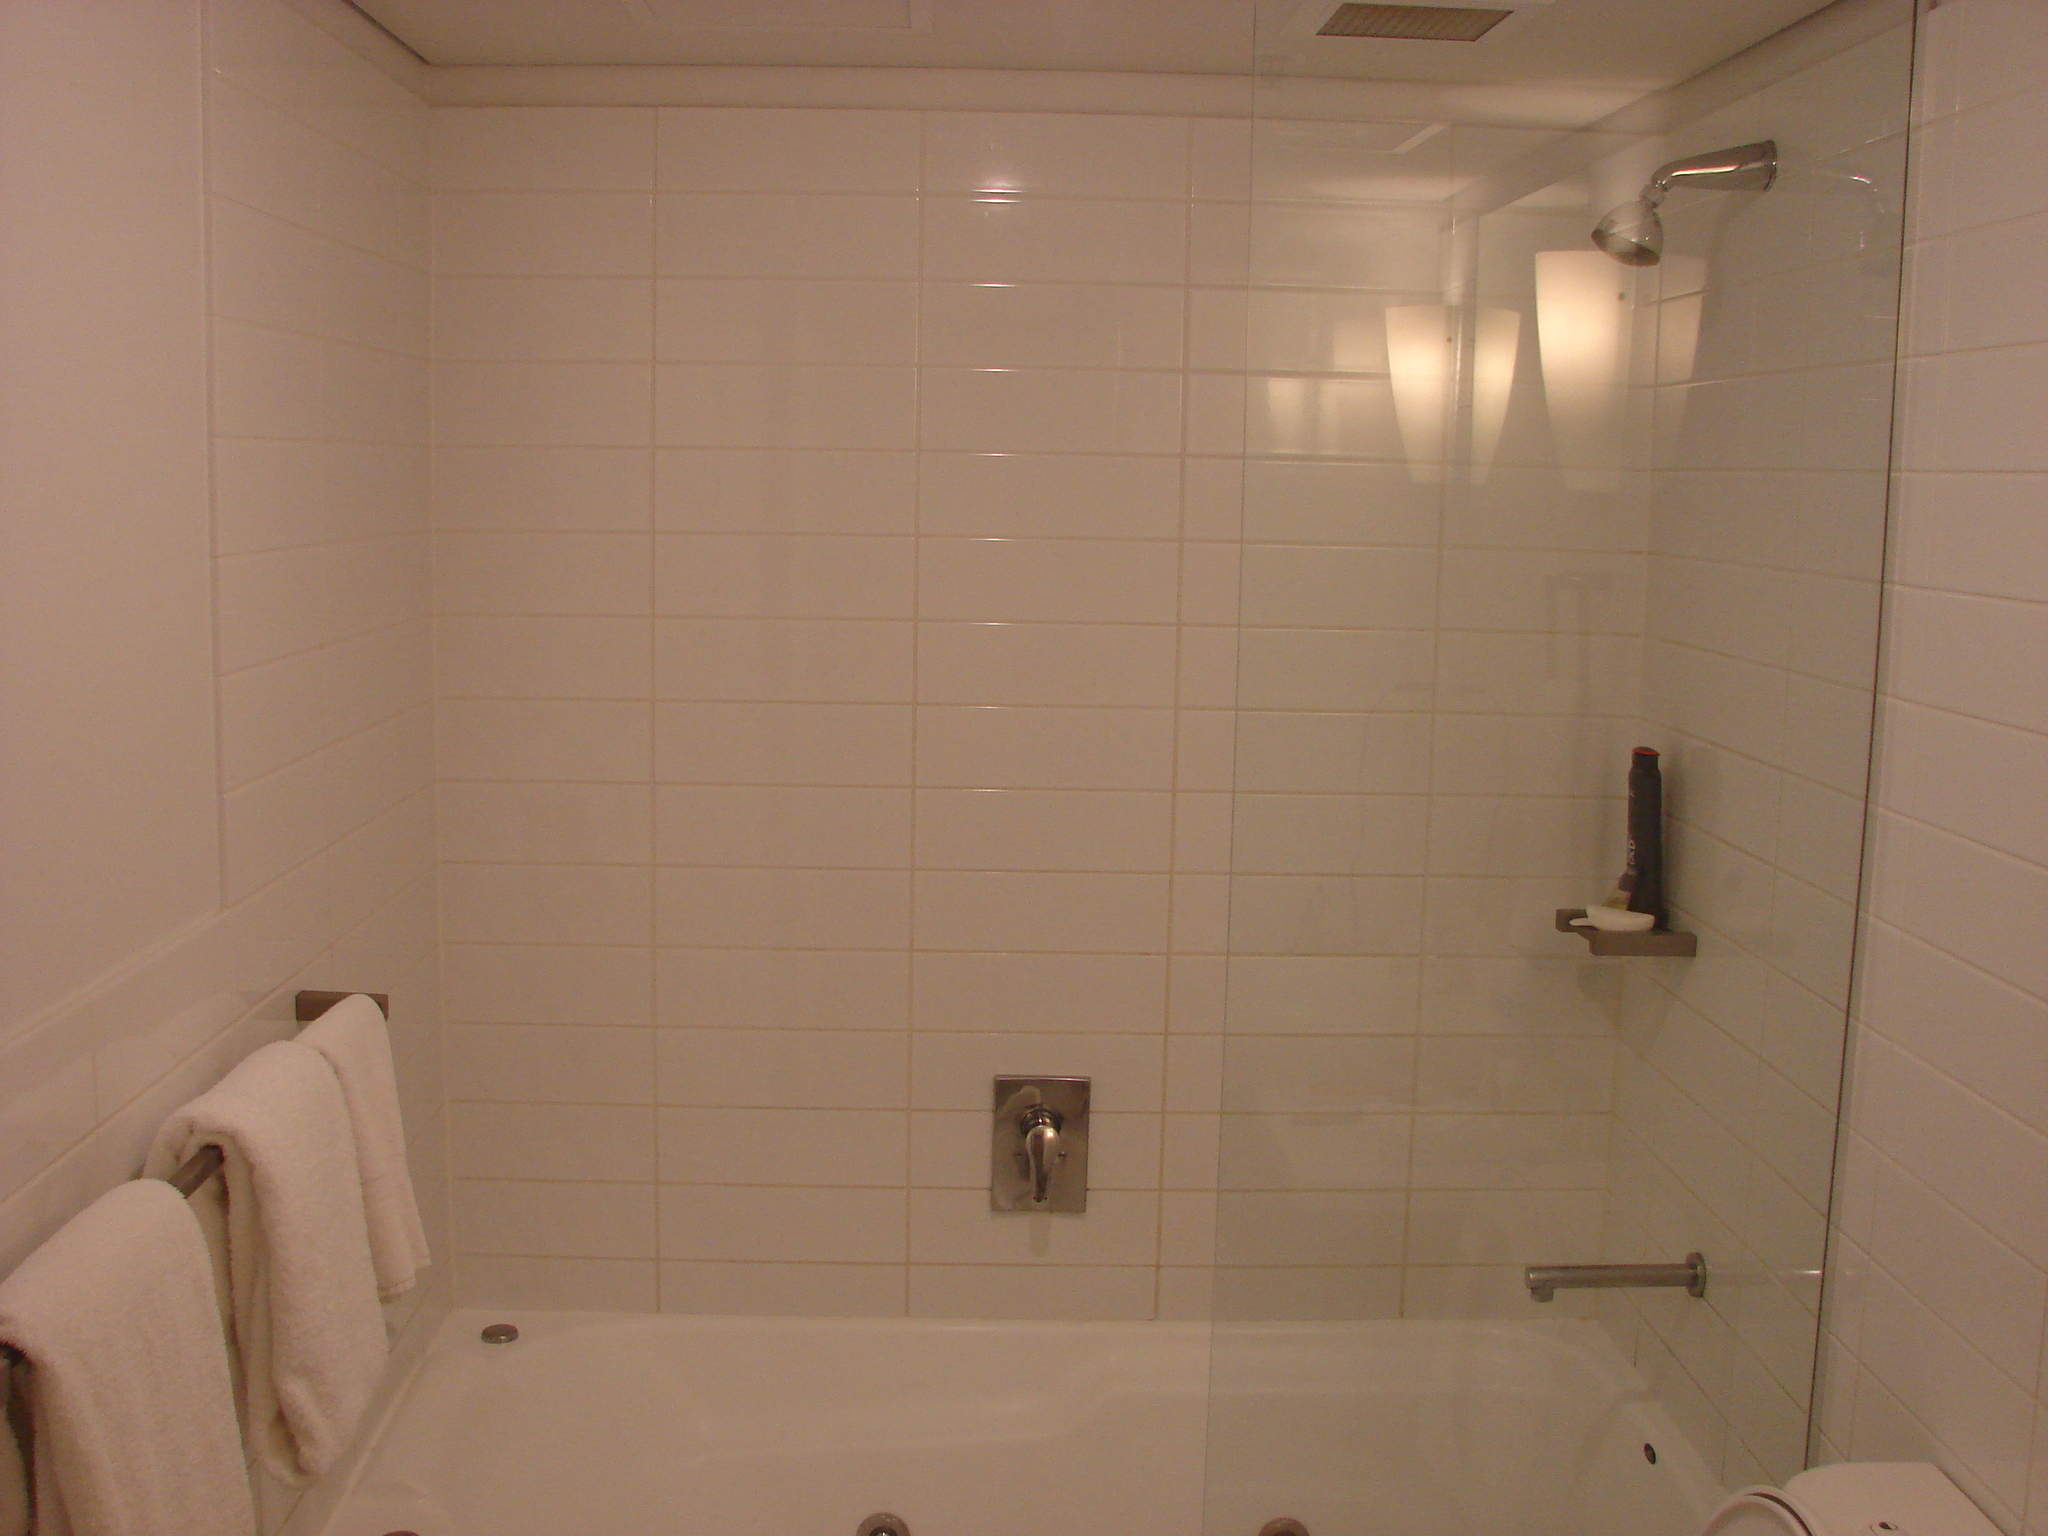 Mother Ideas: European Shower Doors, European Shower Doors | Utah ...